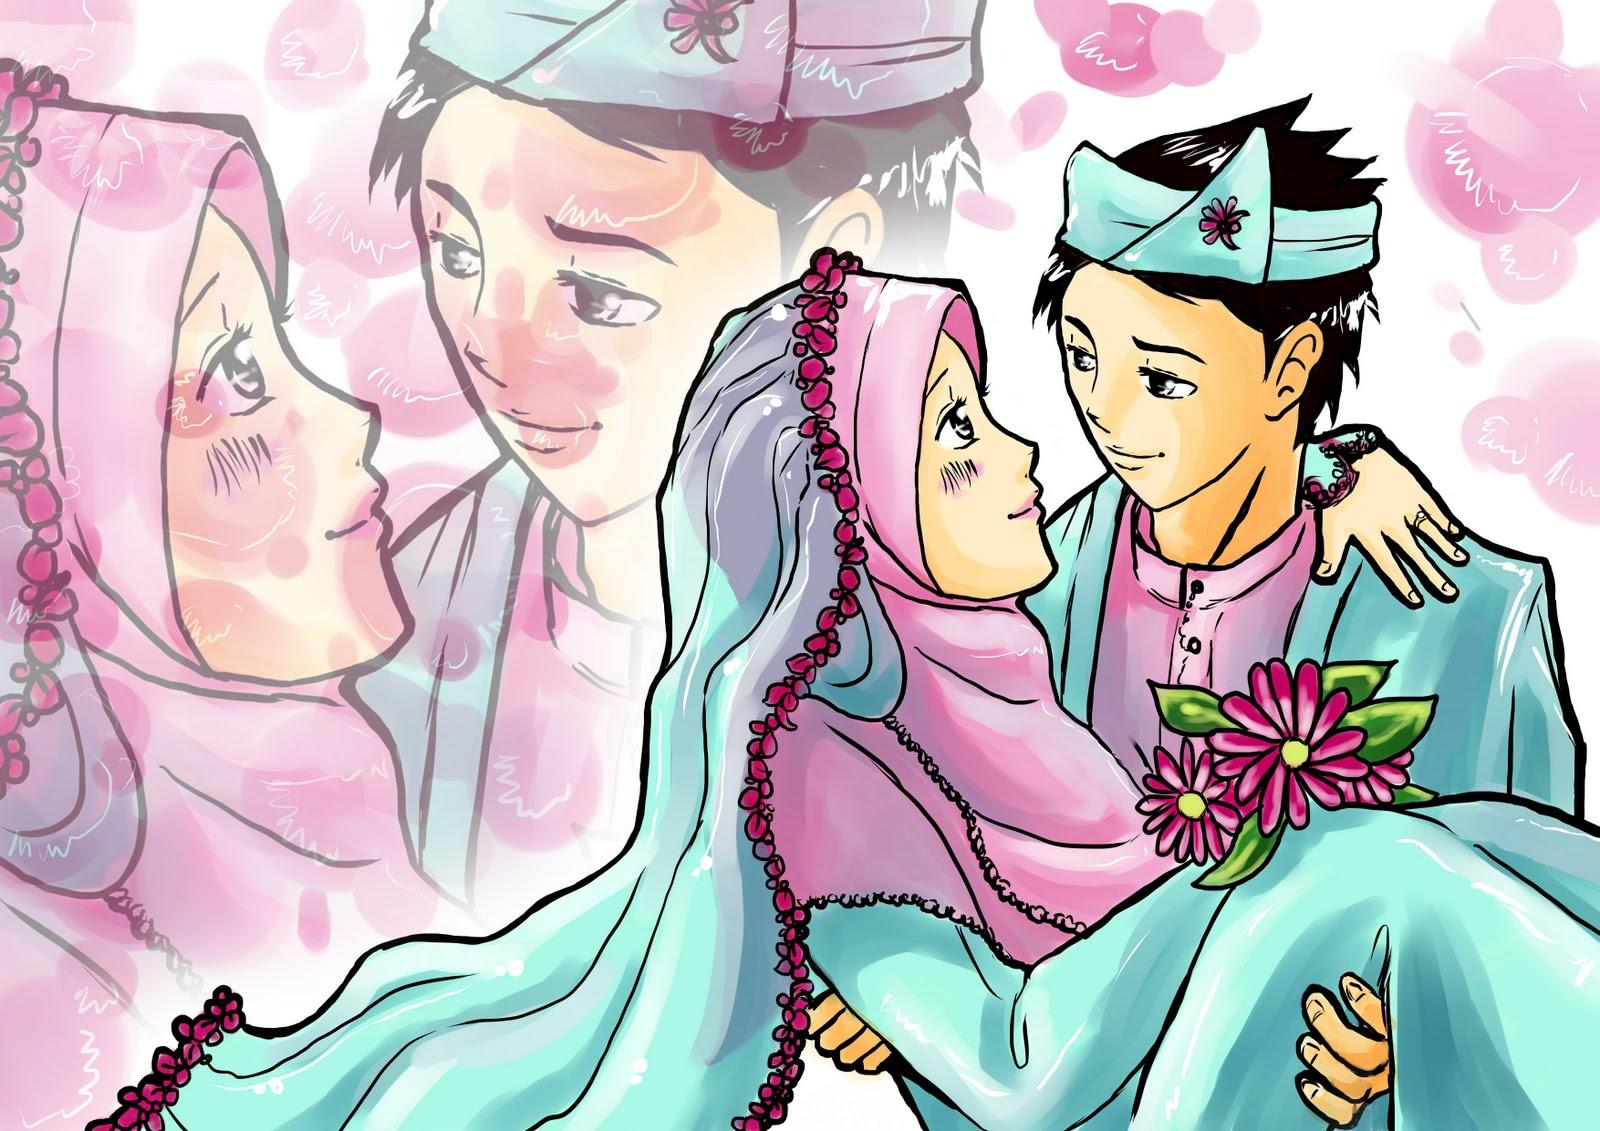 Gambar Kartun Muslimah Berpasangan Bergerak Design Kartun